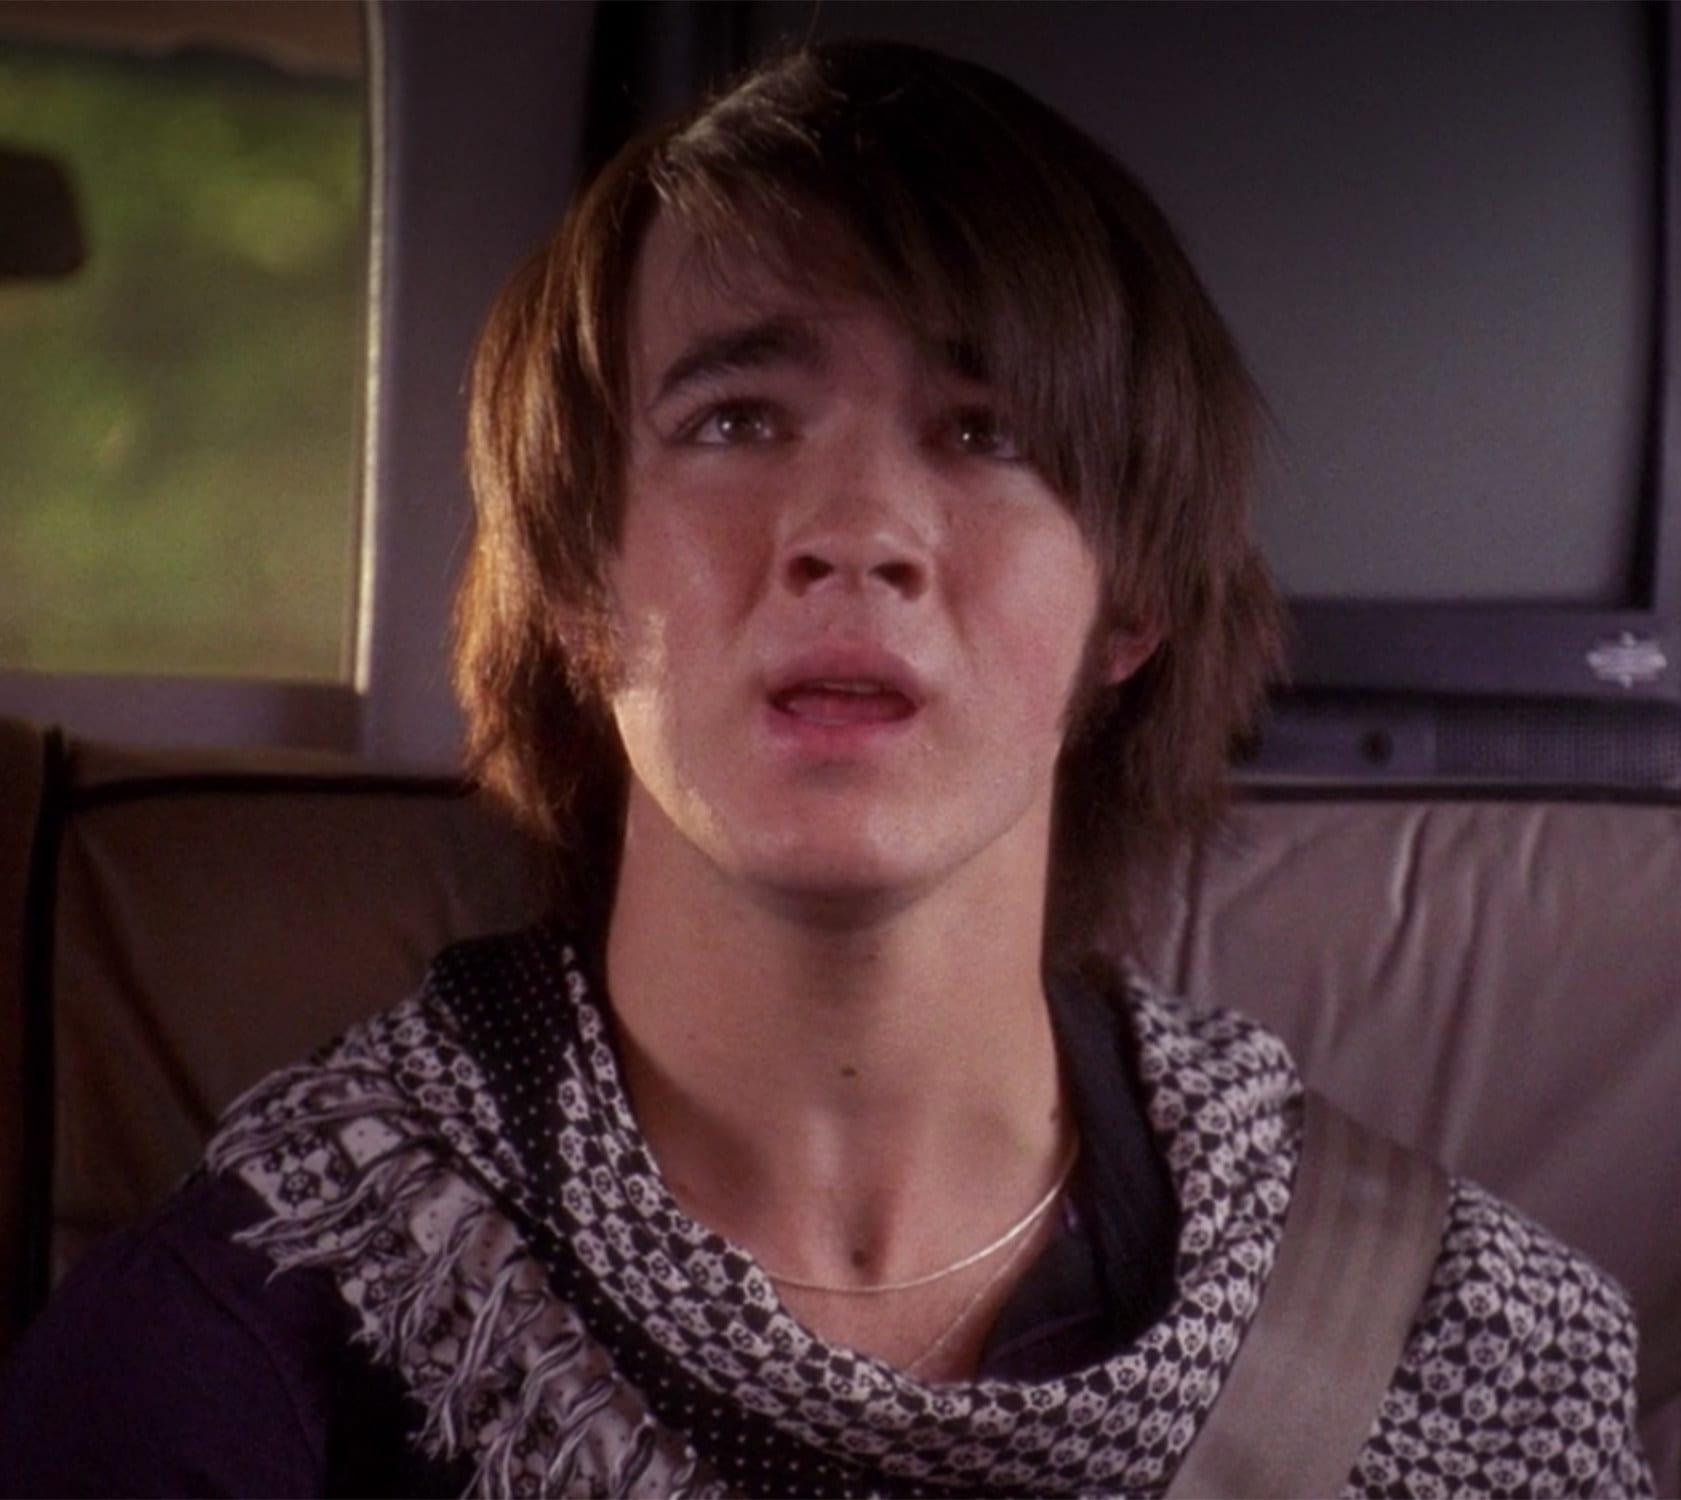 Jason really wanted Shane to make him a birdhouse at camp